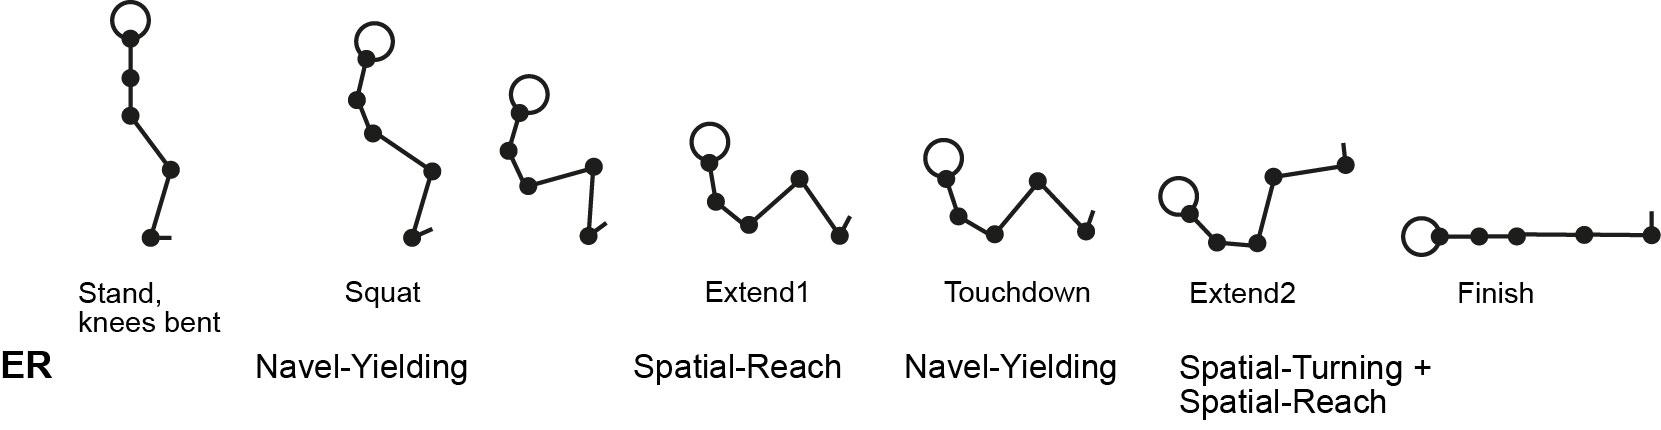 Detailed analysis of backward fall (after Figure 8, Fujiwara et al. (2003))